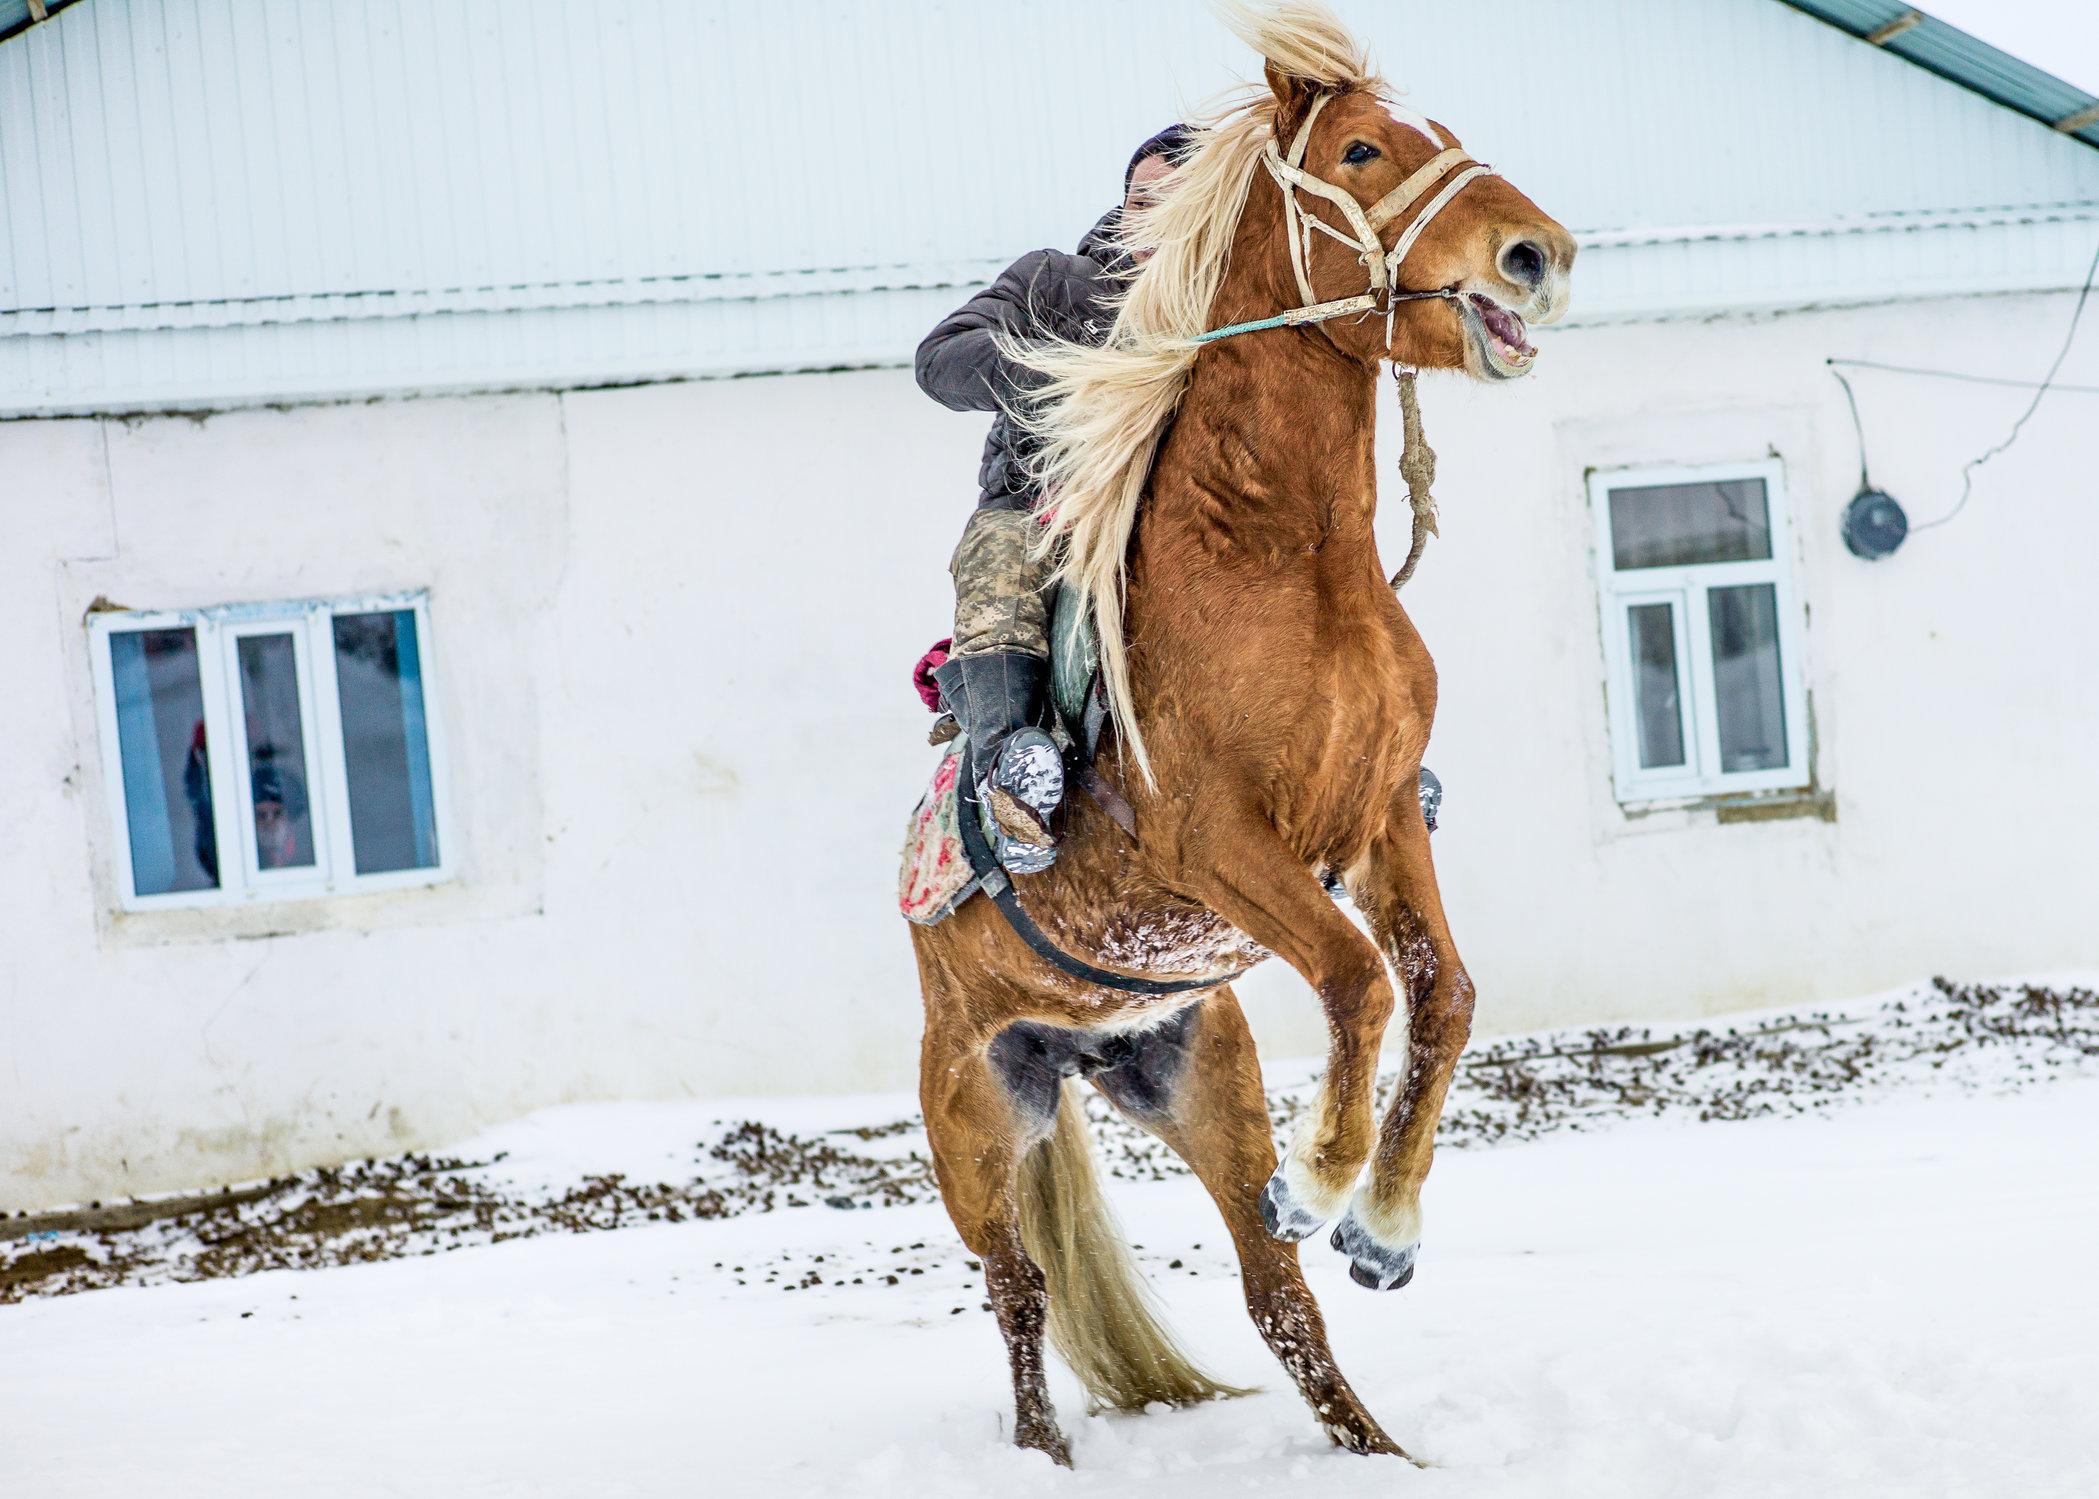 The horse-7.jpg